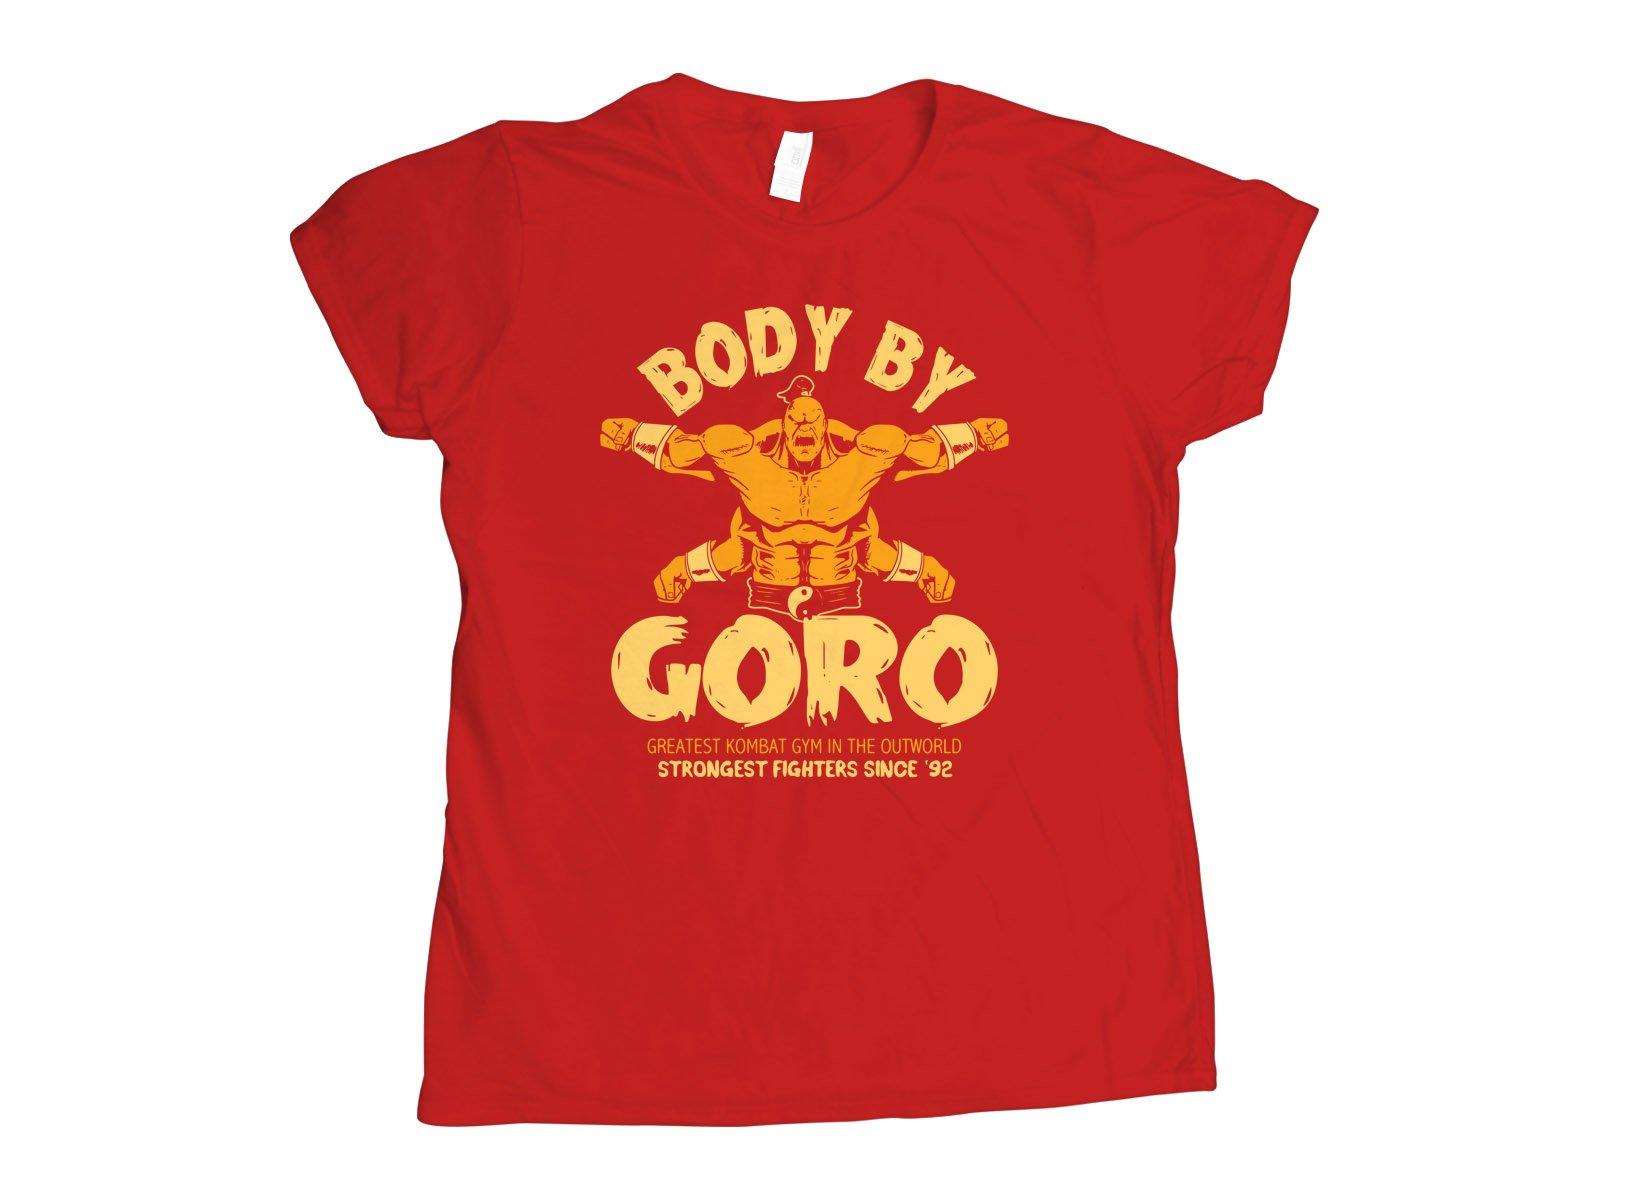 Body By Goro on Womens T-Shirt